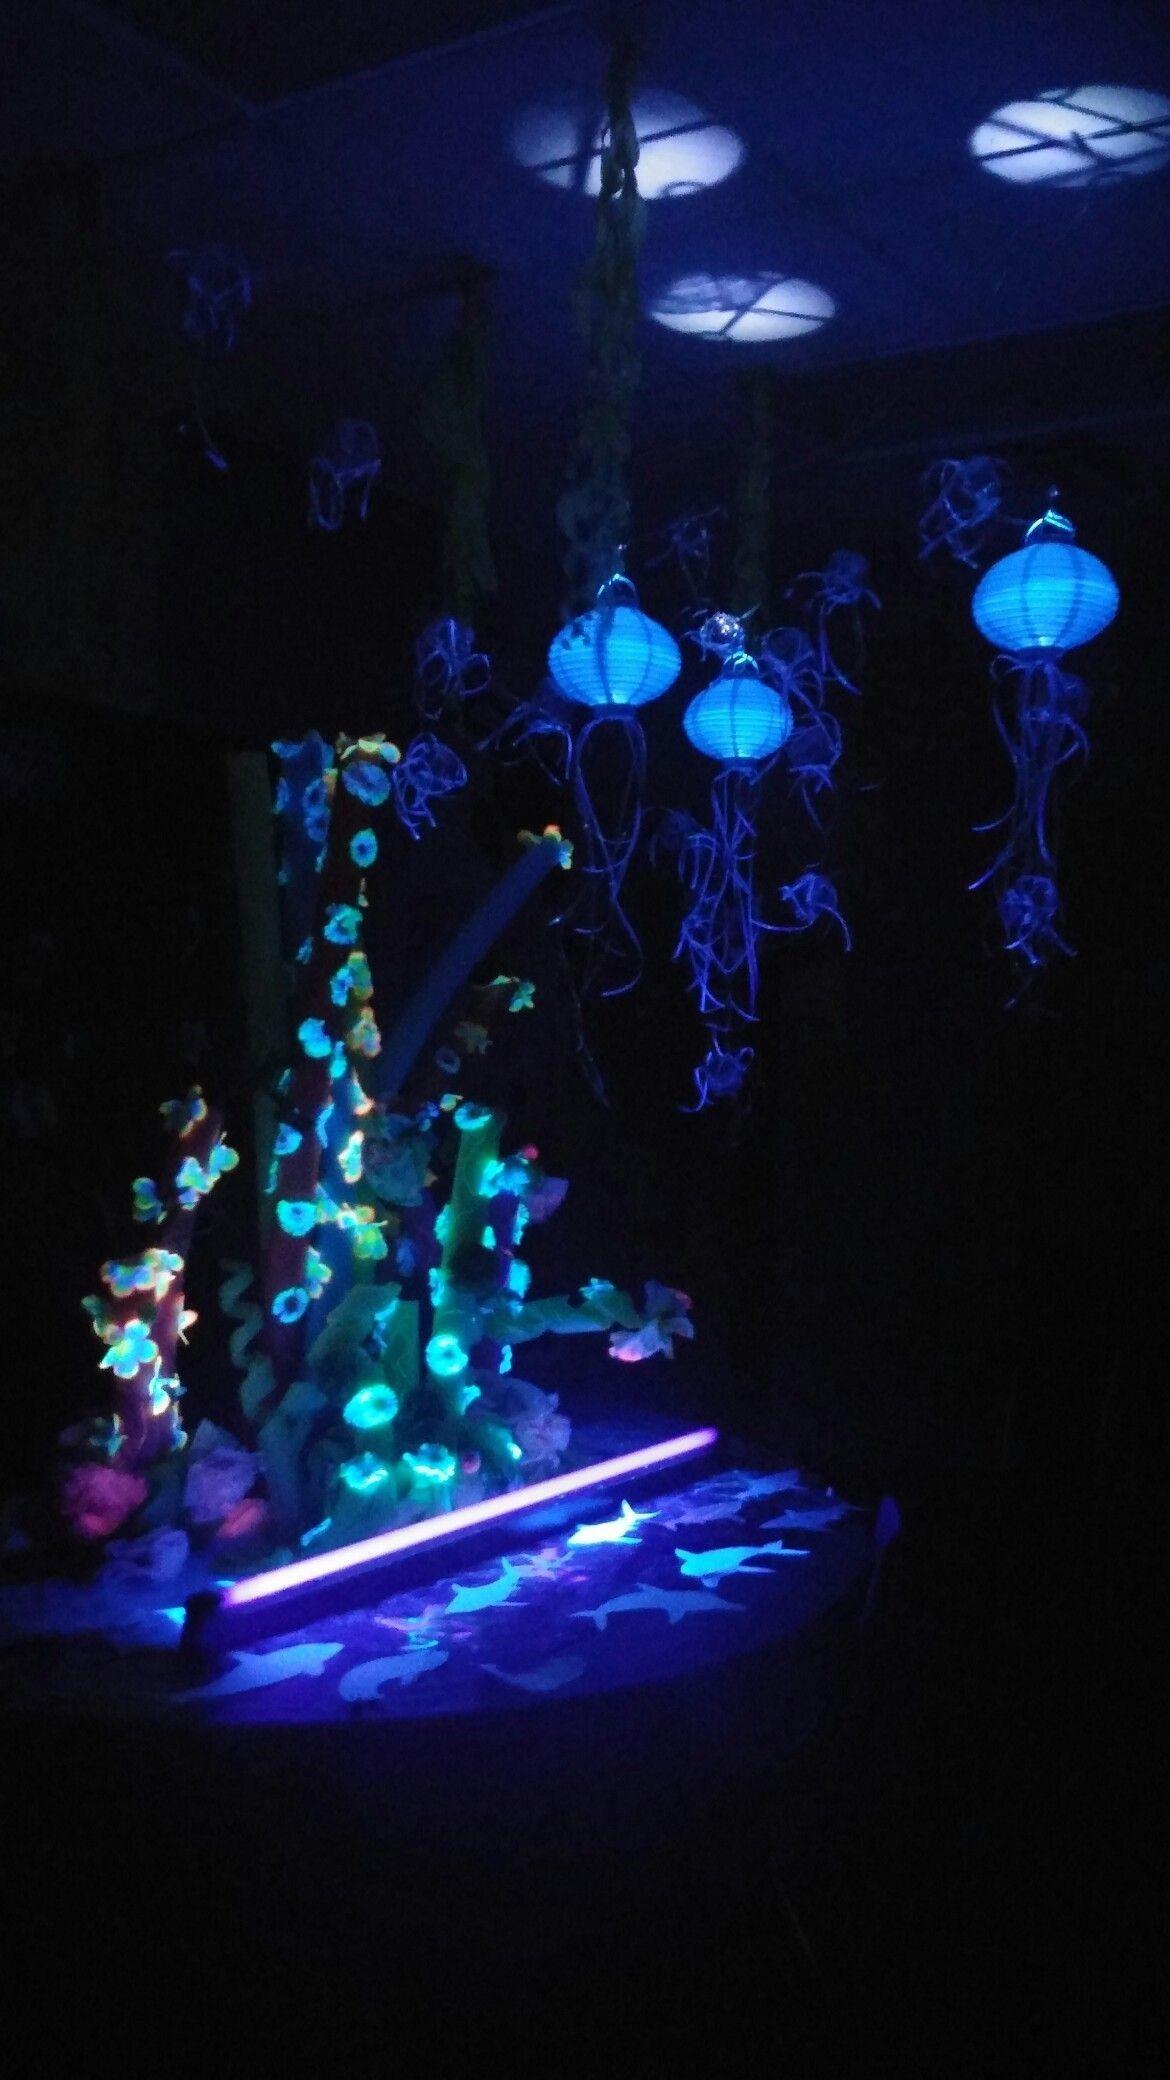 Water Beads for Vases Of 25 Blue Flower Vase the Weekly World Inside Blue Light Black Flower Fresh Vases Flower Vase Coloring Page